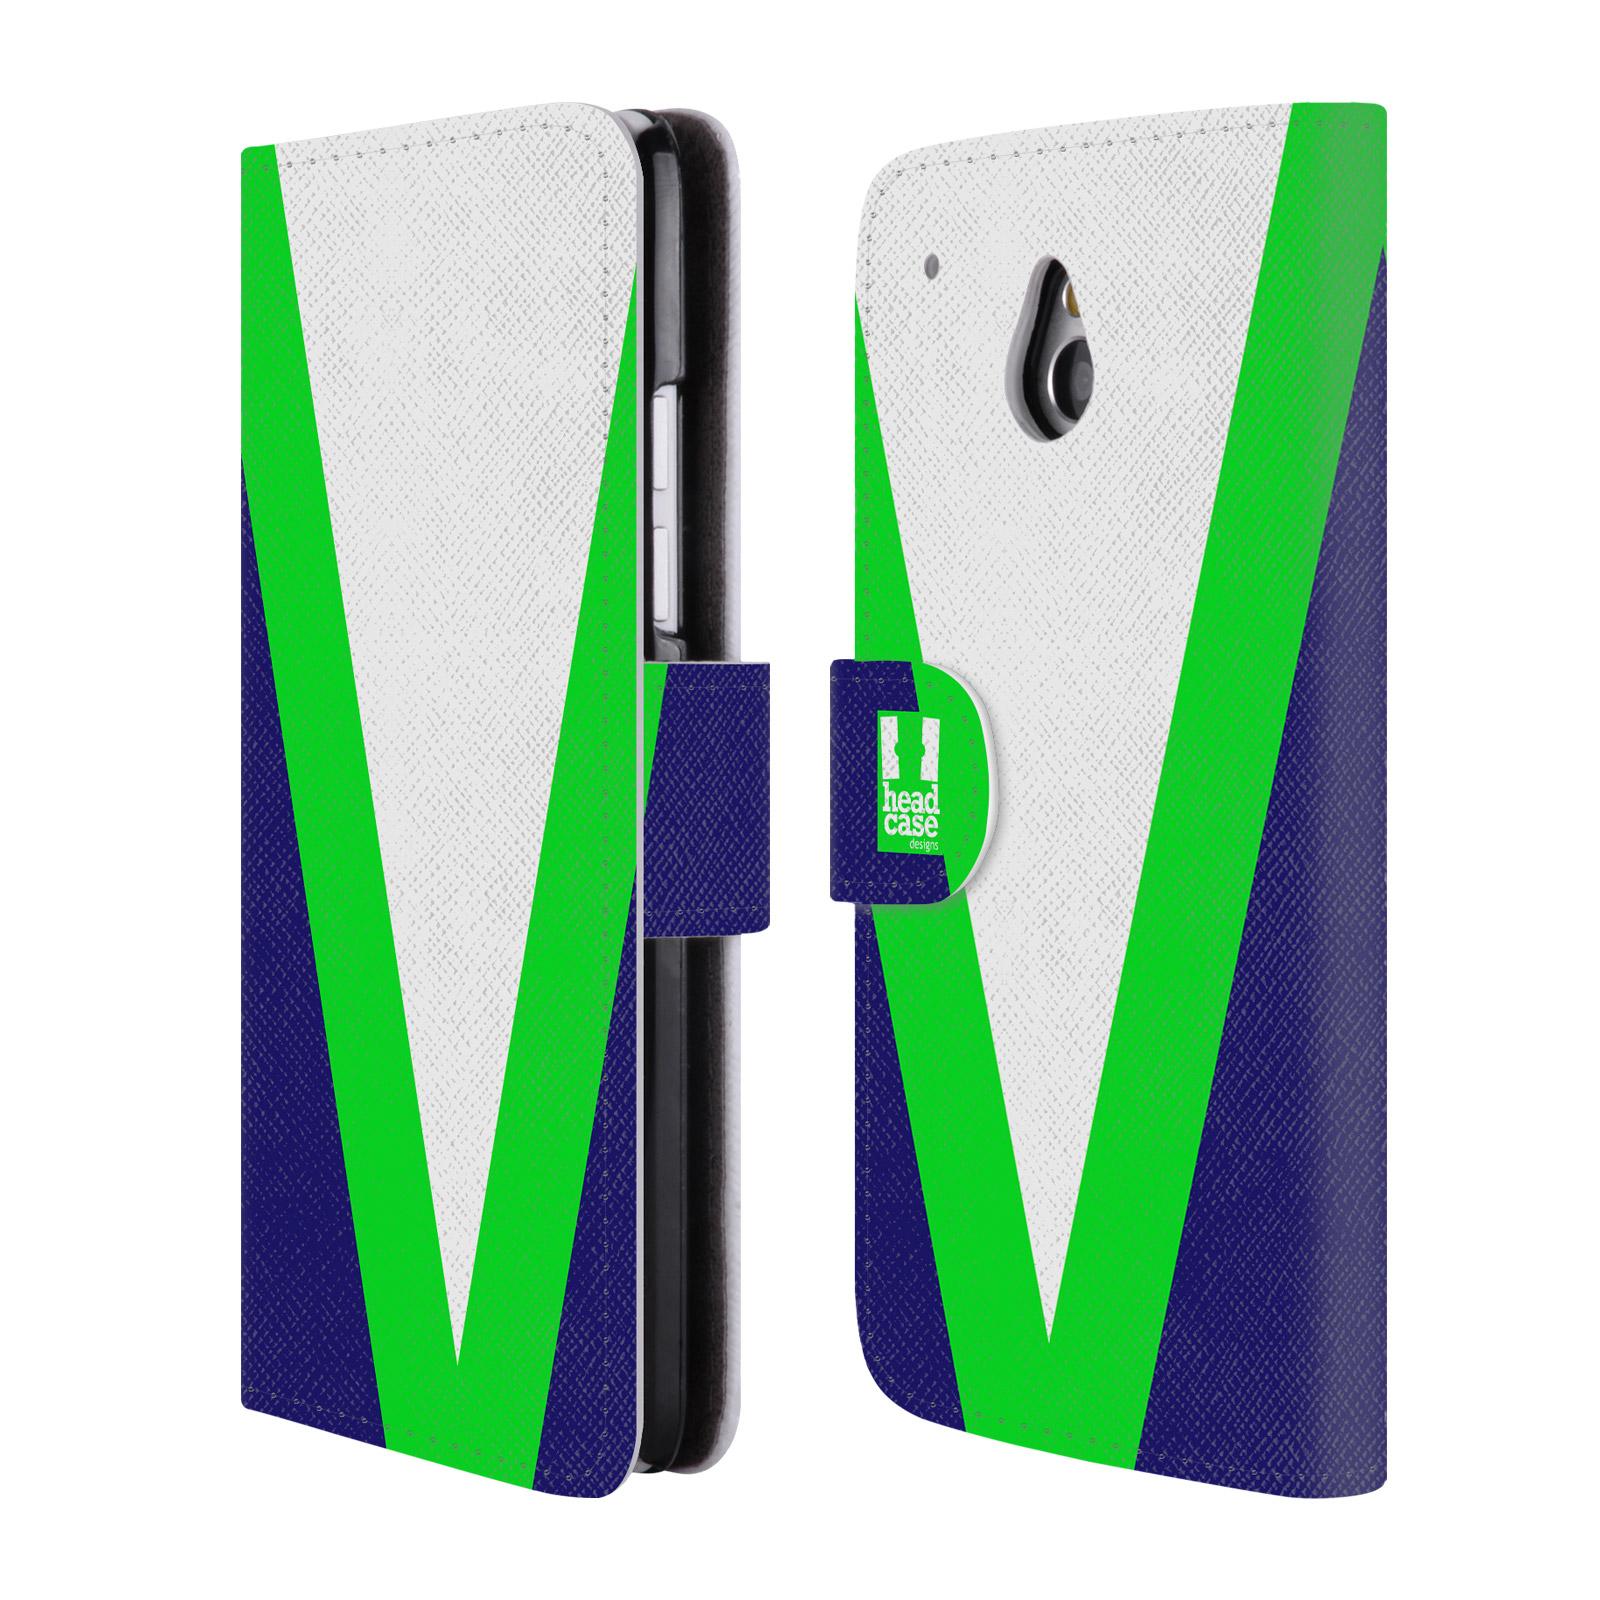 HEAD CASE Flipové pouzdro pro mobil HTC ONE MINI barevné tvary zelená a modrá